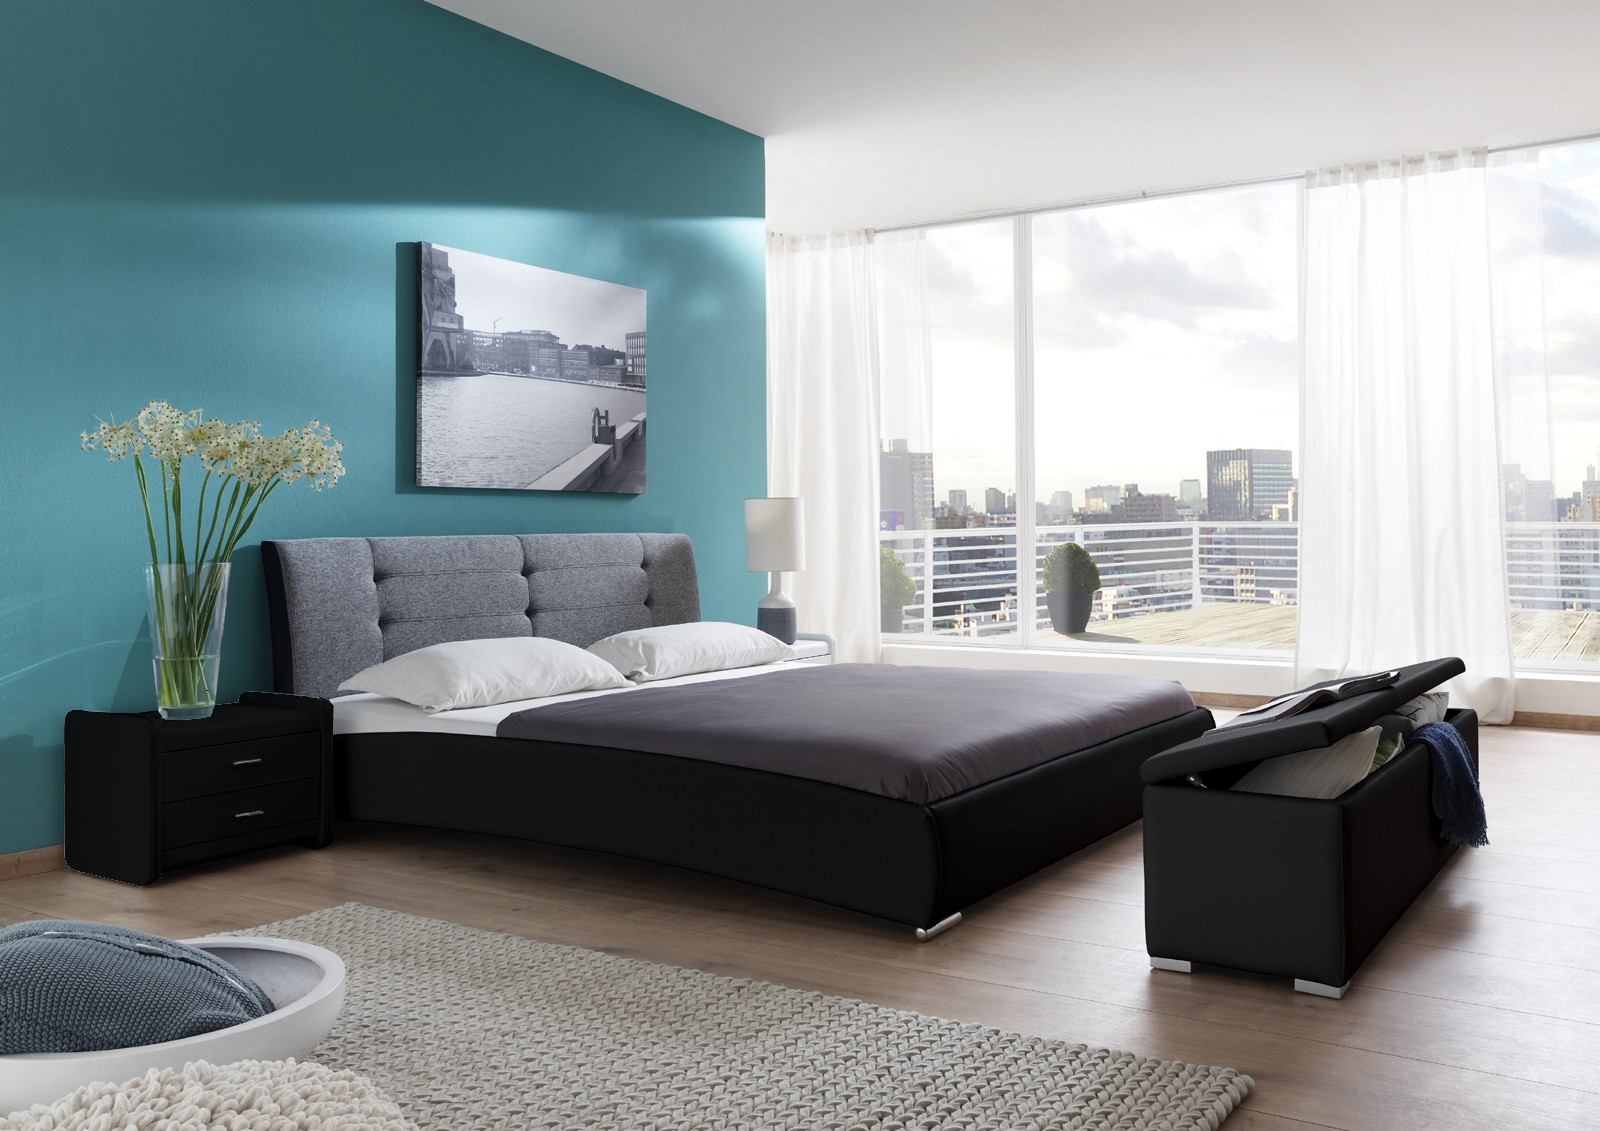 sam polsterbett doppelbett 140 x 200 cm schwarz grau bebop. Black Bedroom Furniture Sets. Home Design Ideas